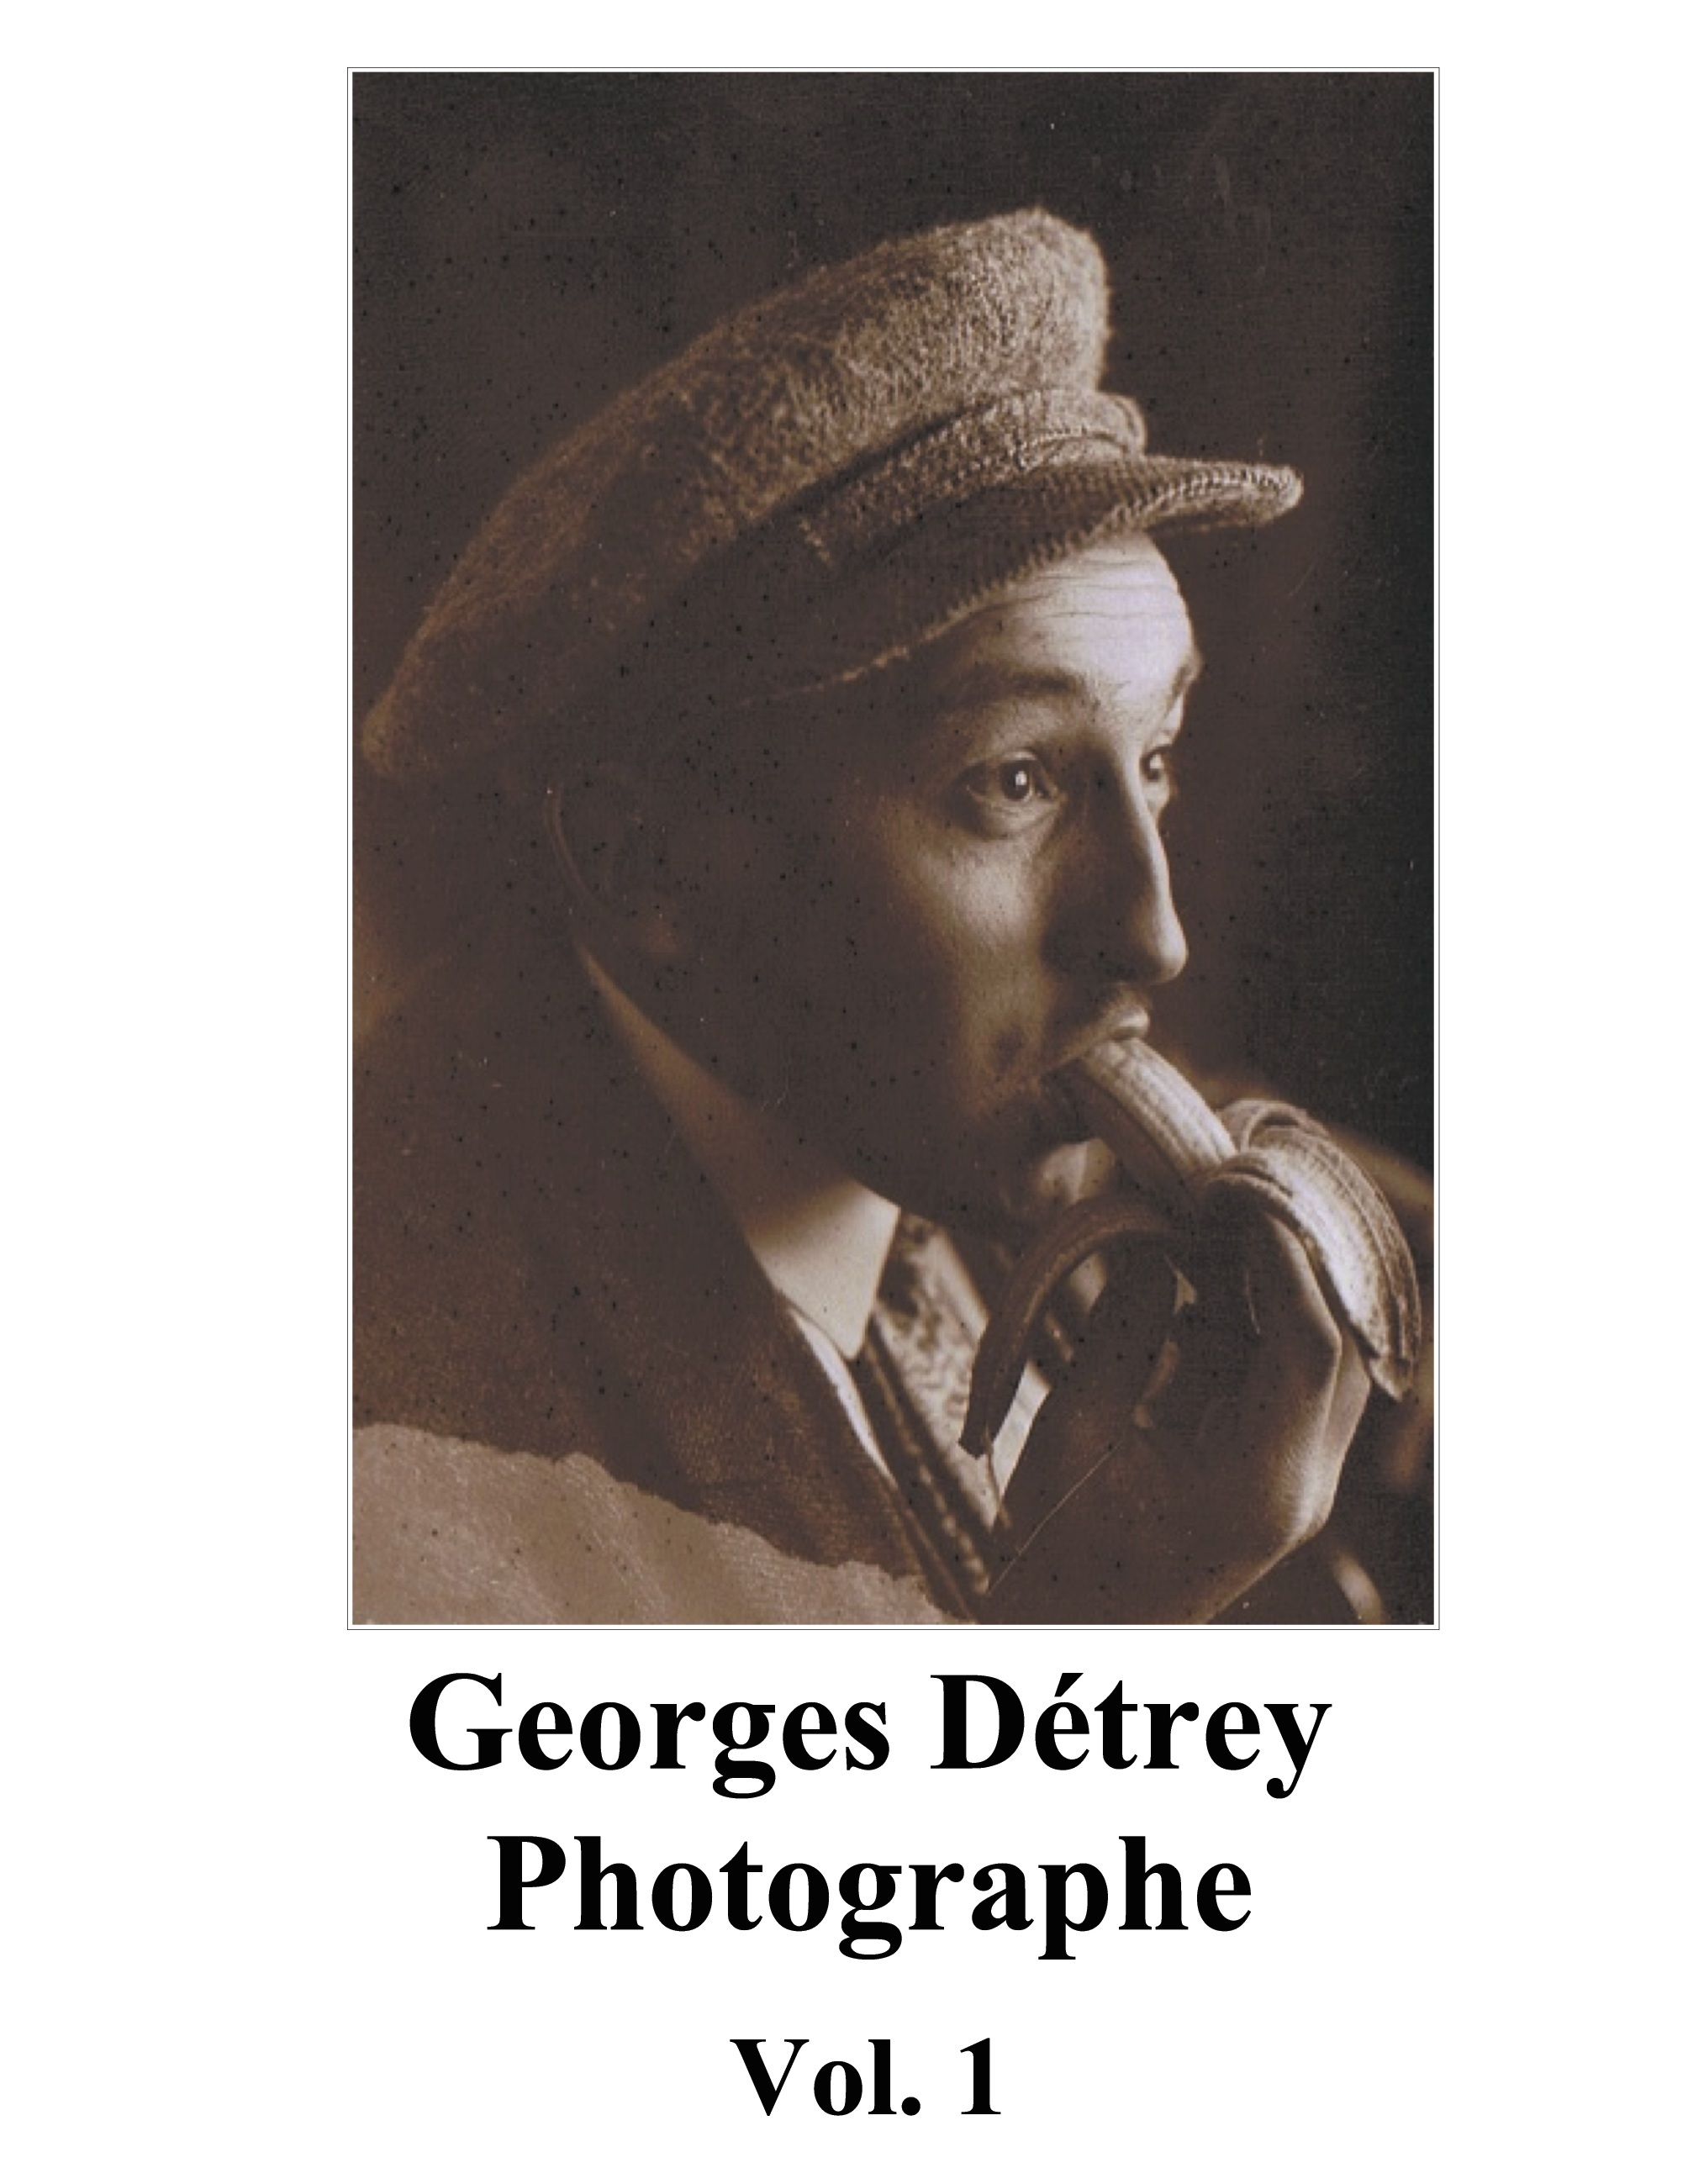 GEORGES DETREY, PHOTOGRAPHIES, VOL. 1 - EUROPE 1930-1950